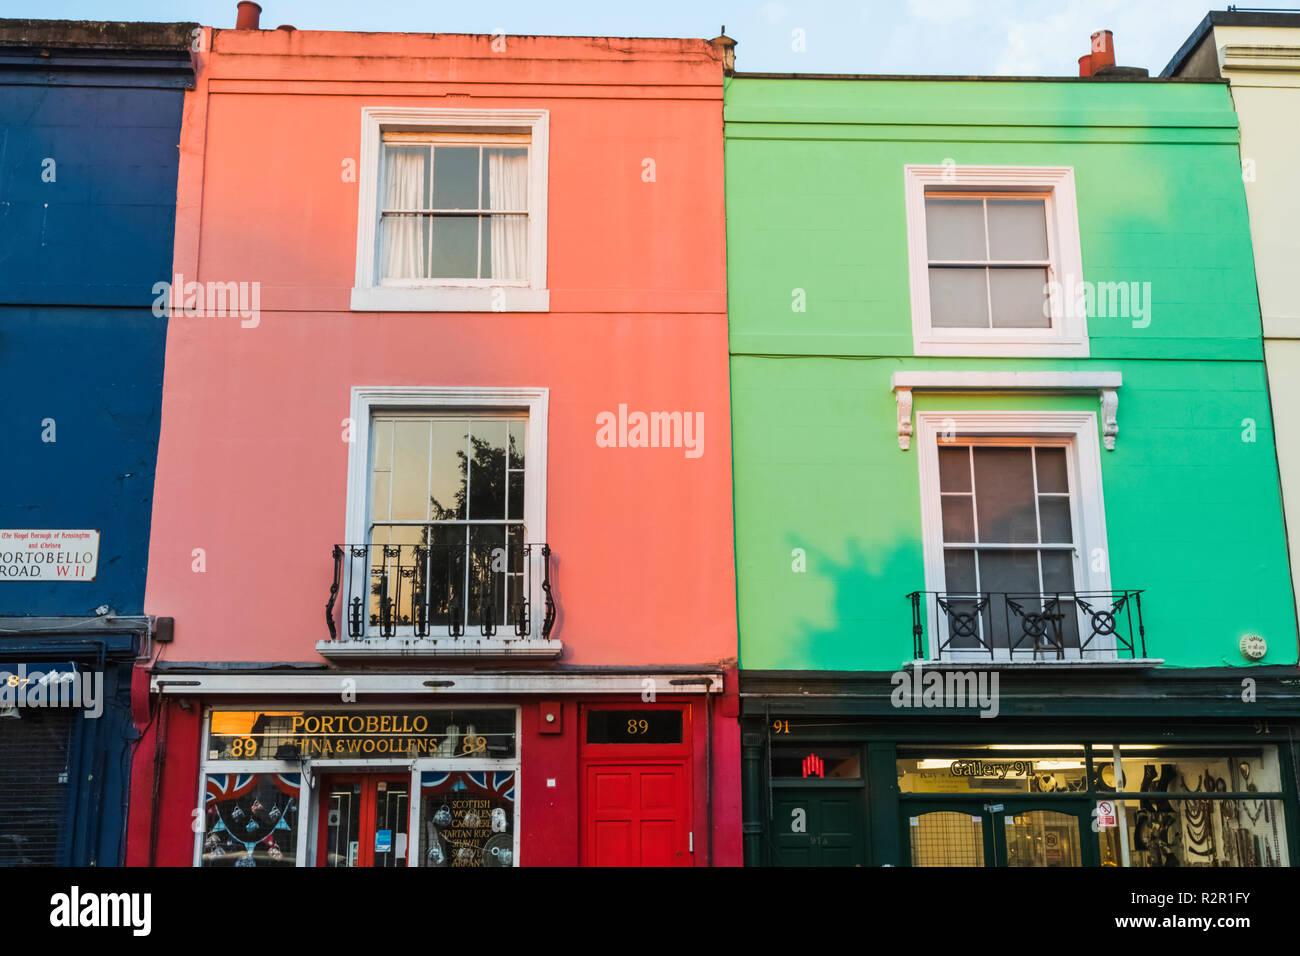 England, London, Notting Hill, Portobello Road, Antique Shops - Stock Image